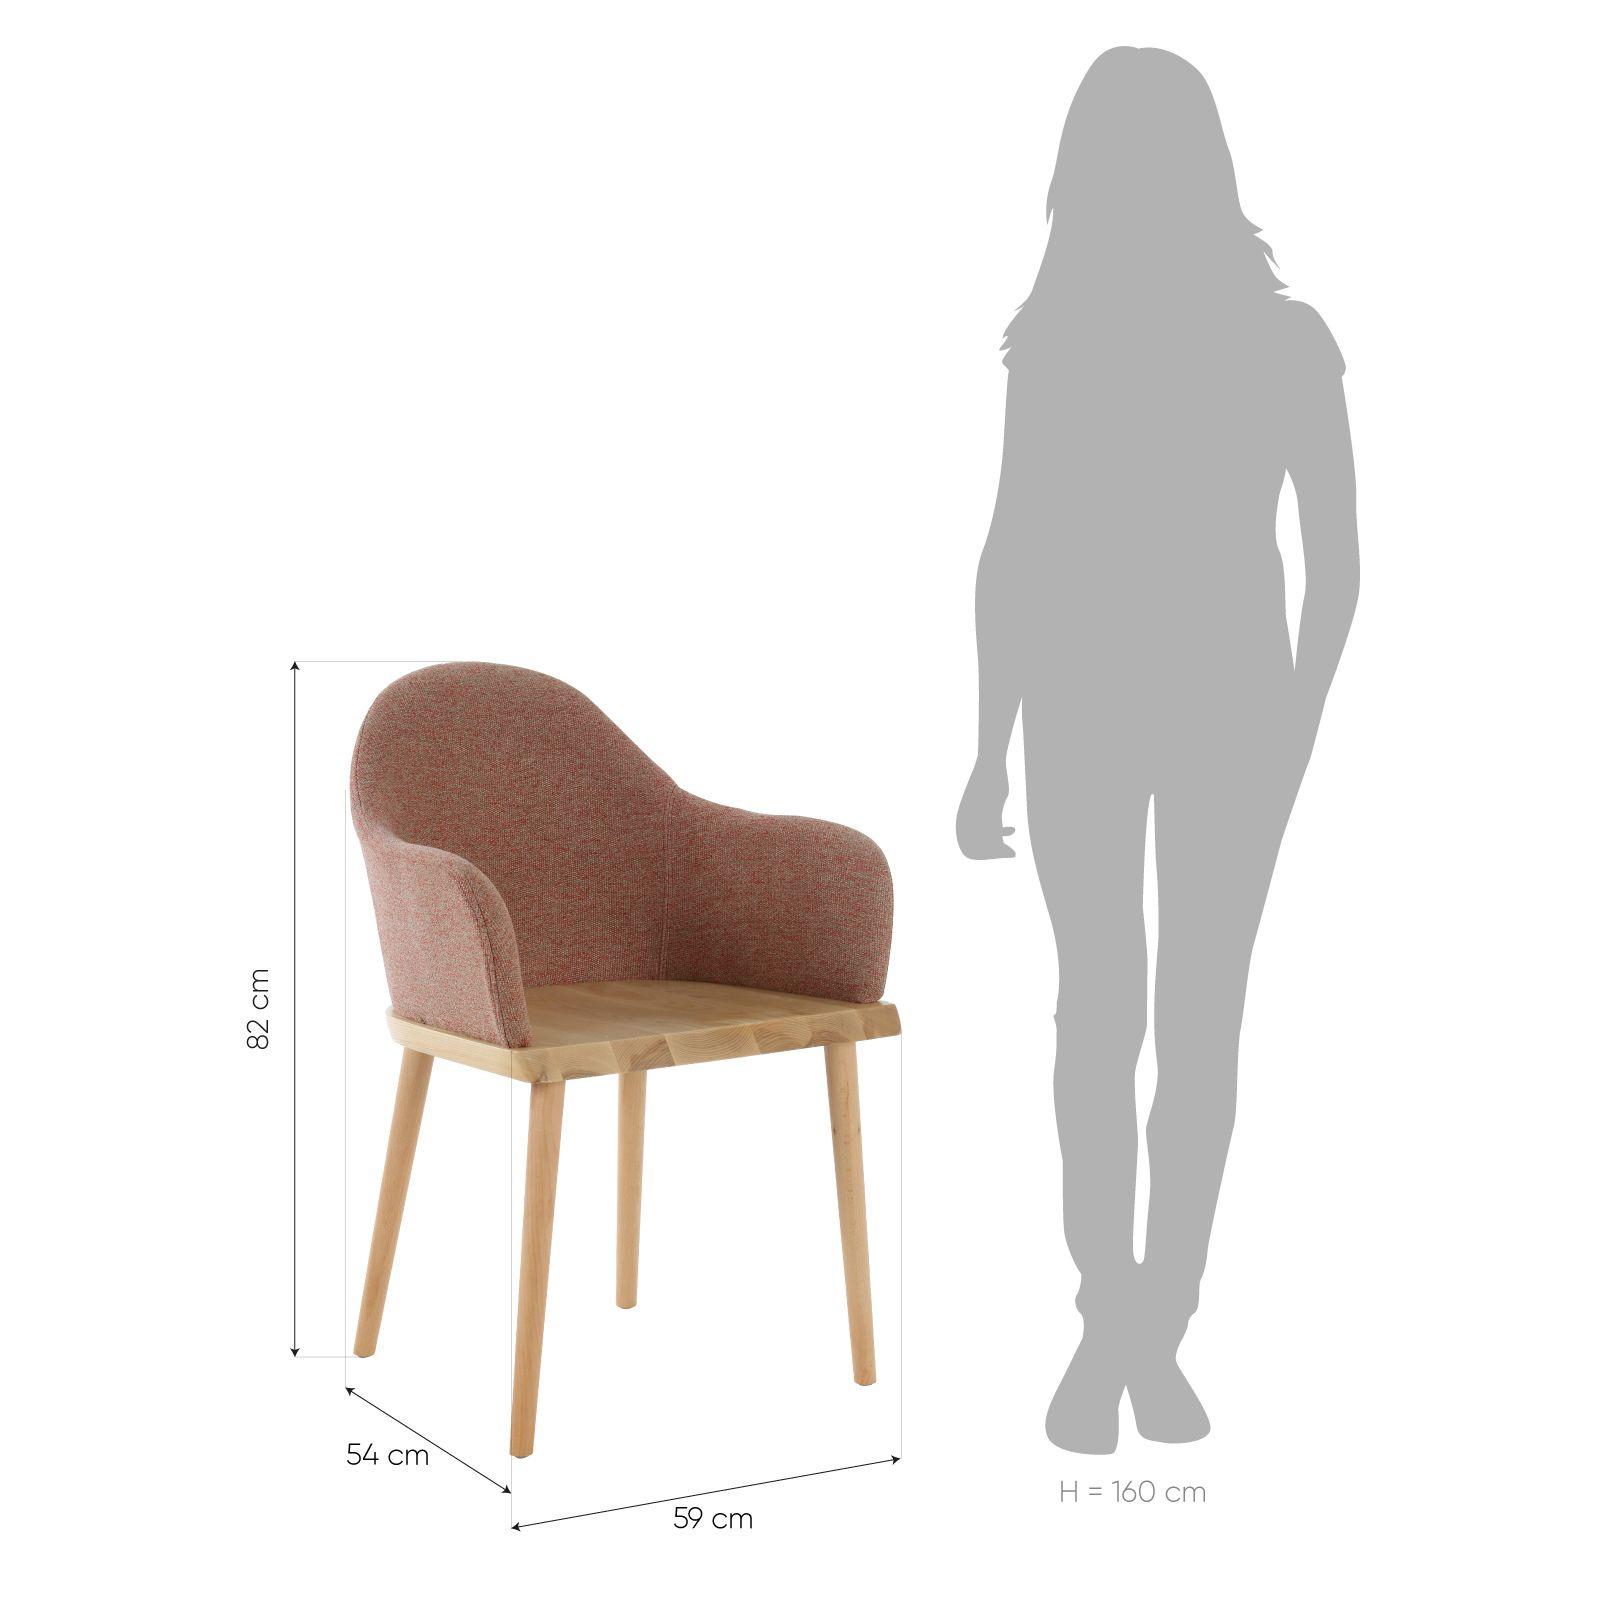 BEKSAND Linen | Silla con brazos. Madera de fresno y tapizado beige (57 x 54 x 82 cm)